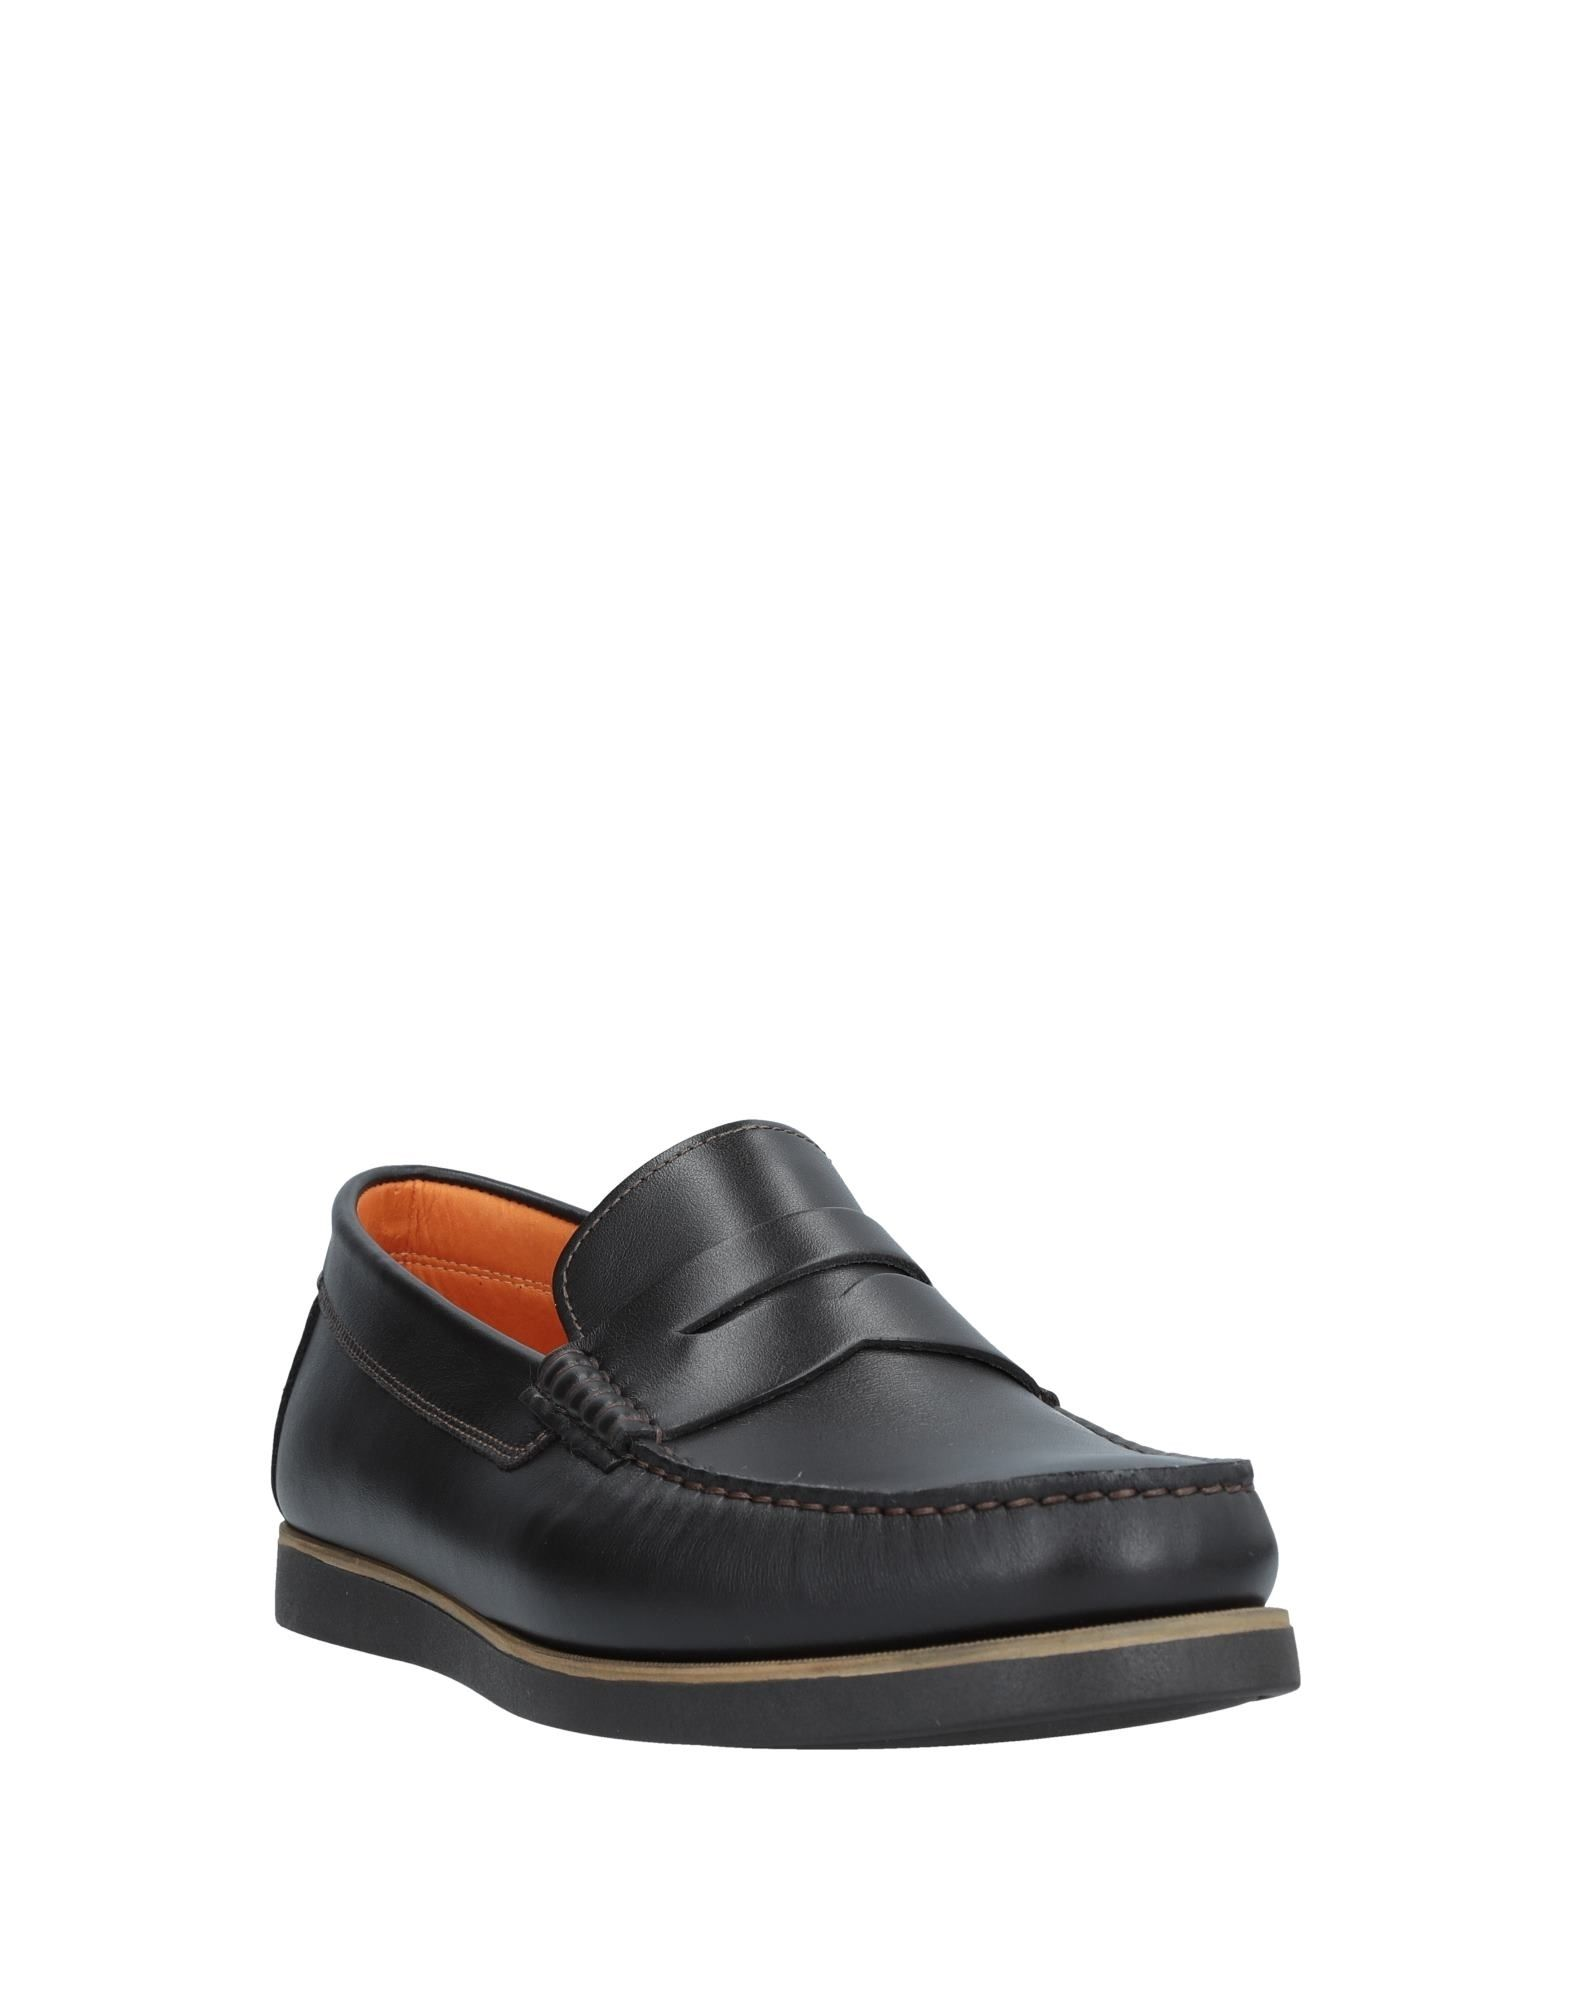 Pellettieri Di Schuhe  Parma Mokassins Herren  11538052WI Heiße Schuhe Di 50eaa6